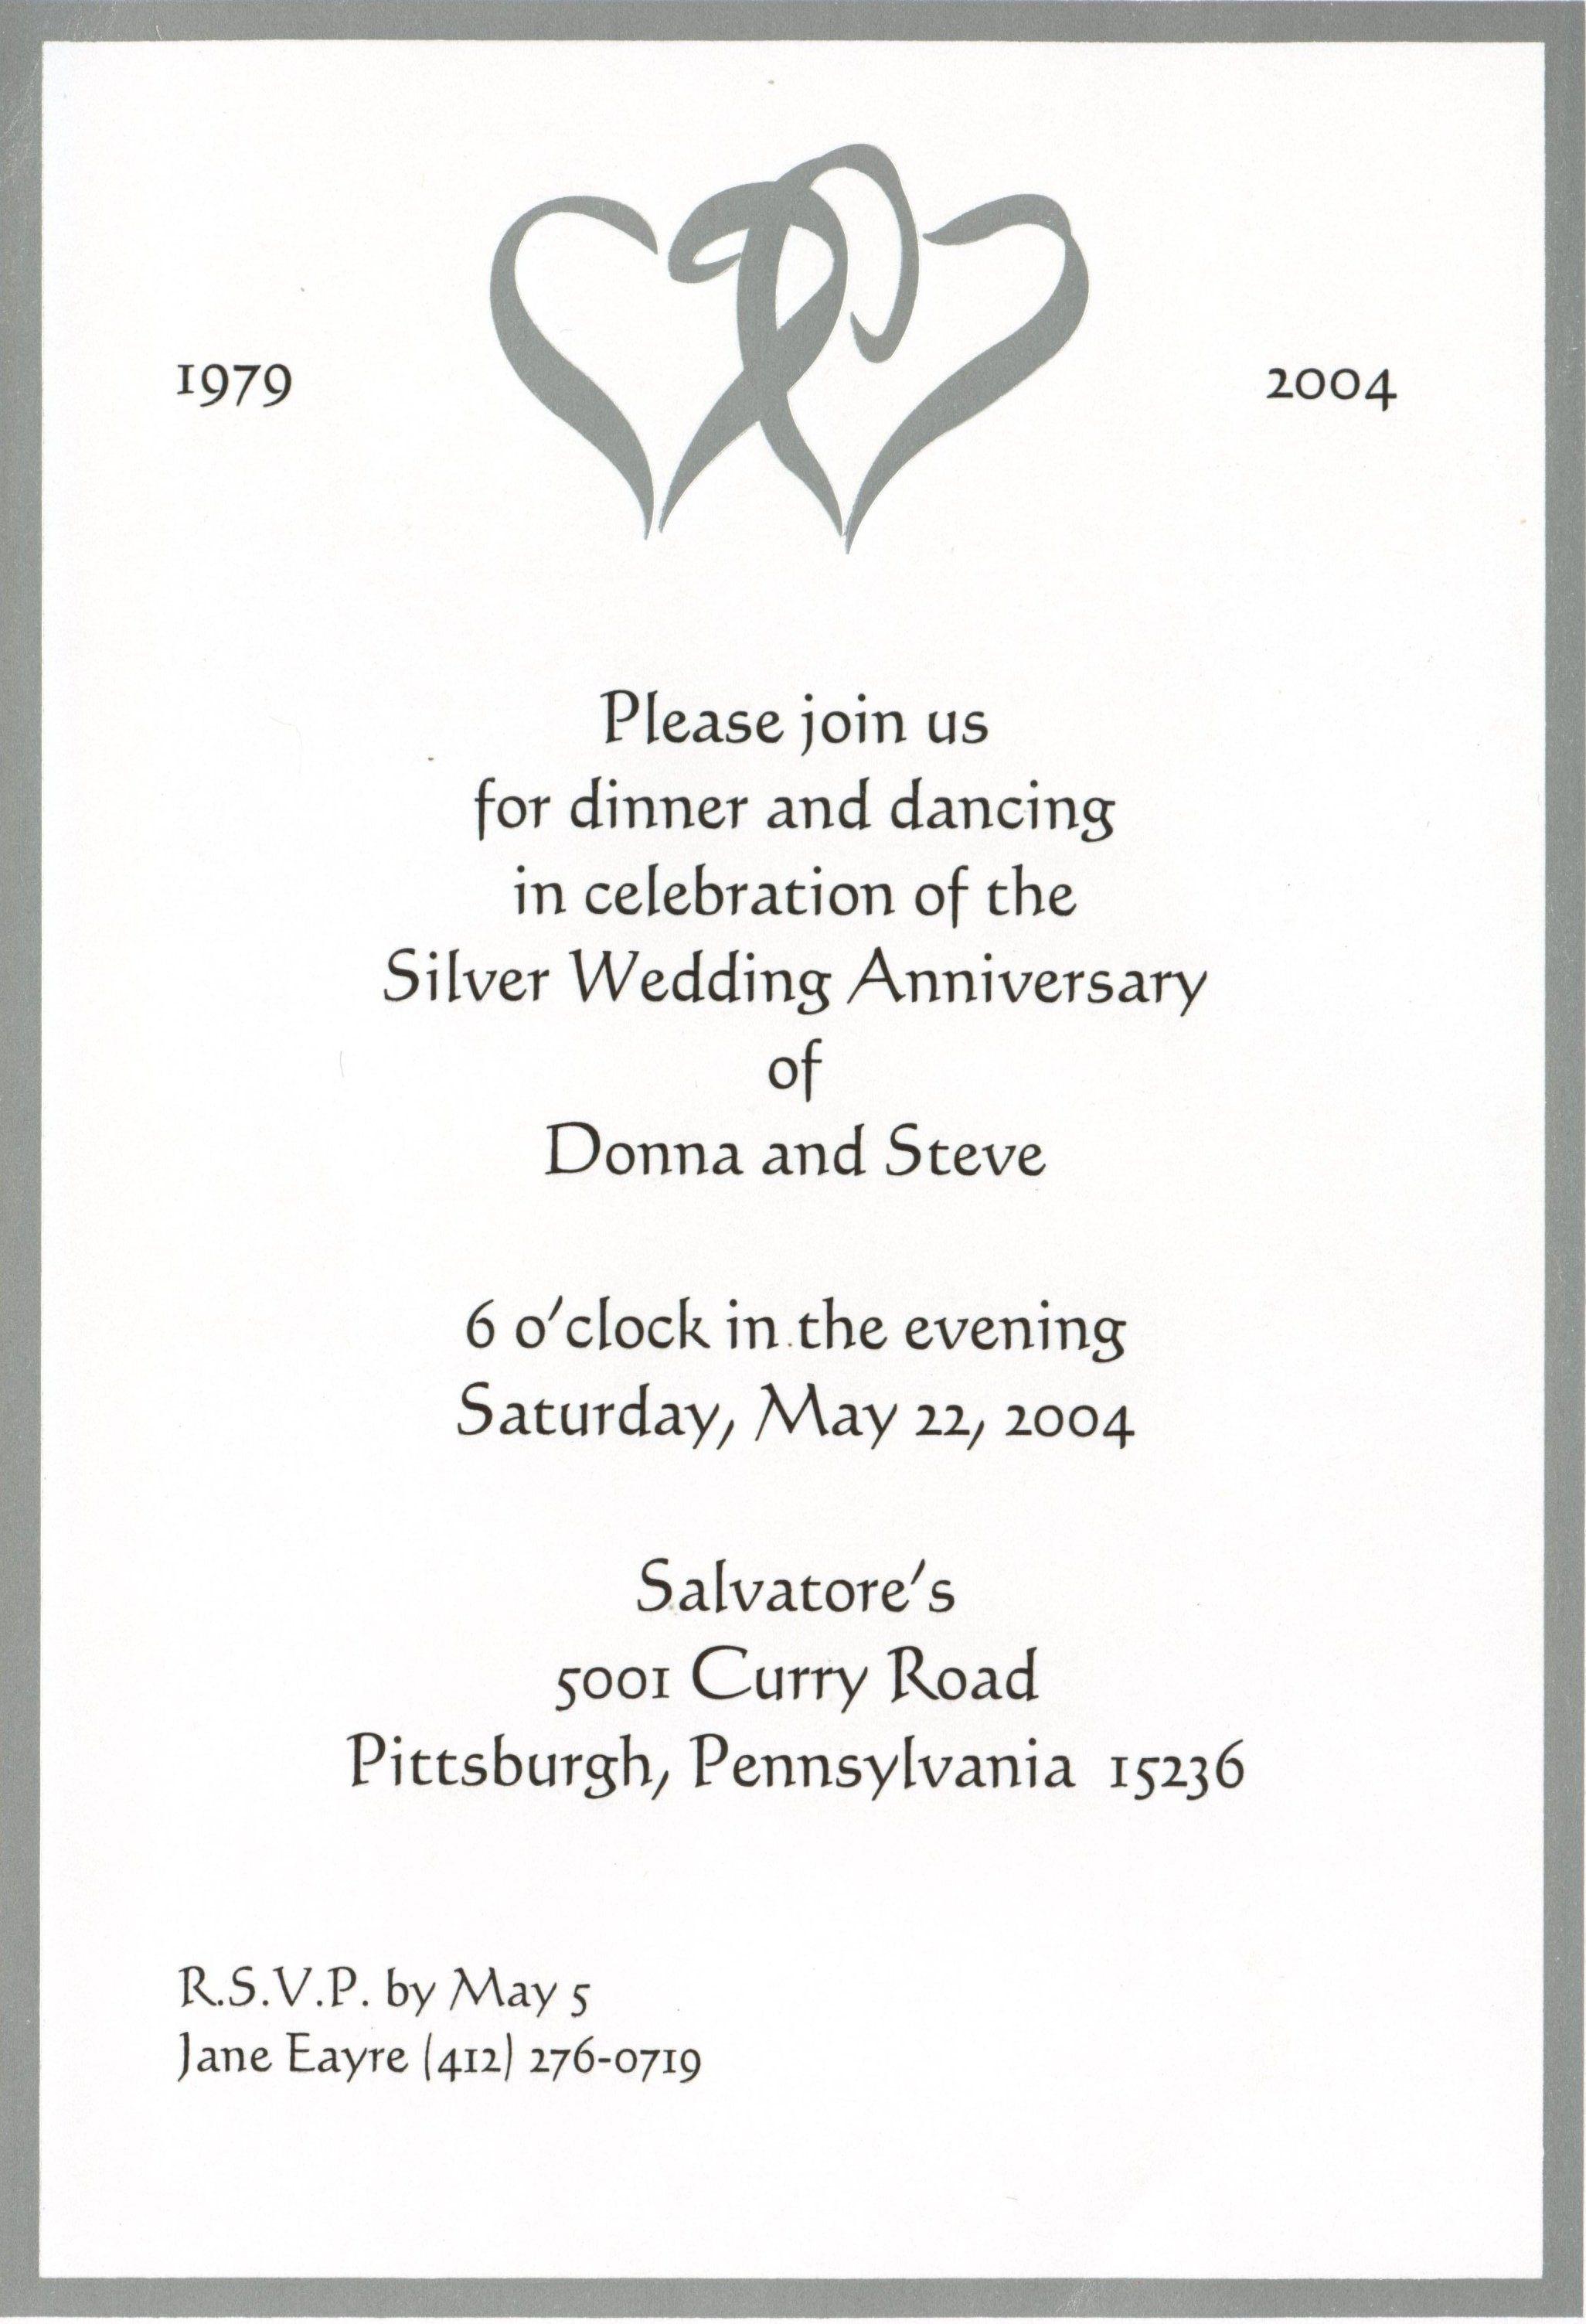 25Th Wedding Anniversary Invitation Cards Templates • Invitation - Free Printable 40Th Anniversary Invitations